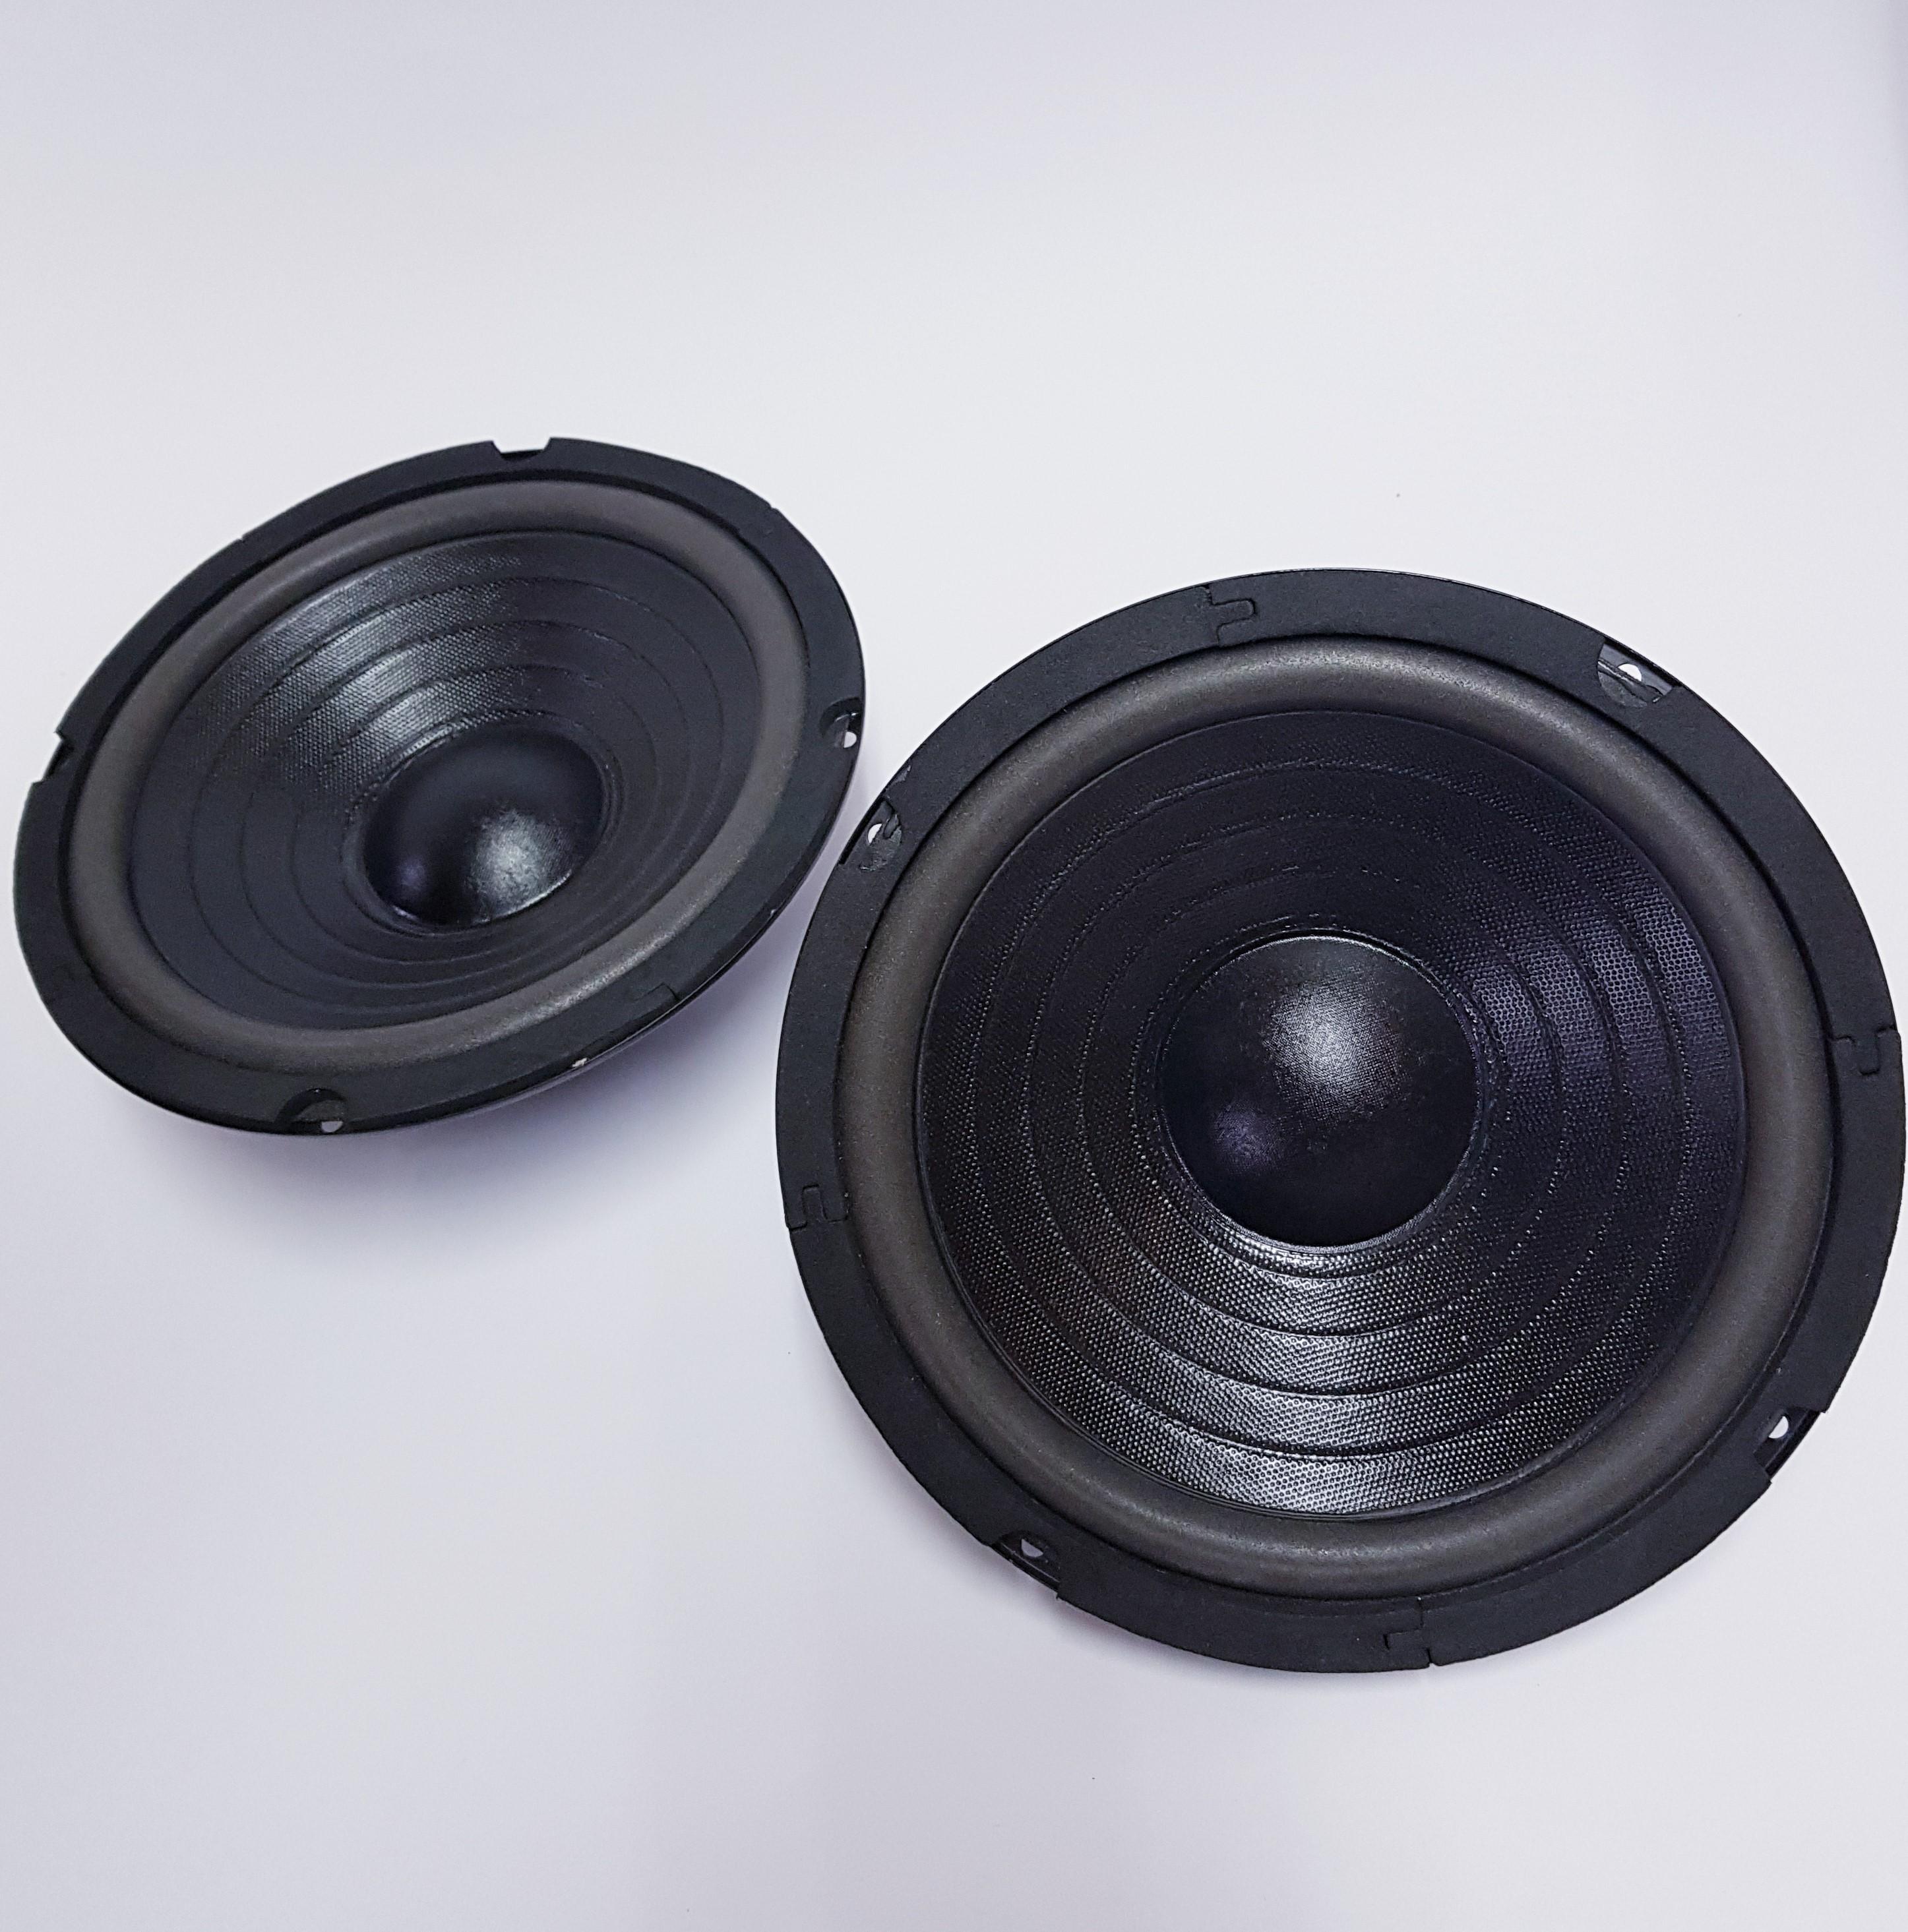 18 u2032 600w loose speaker  u2013 sircony